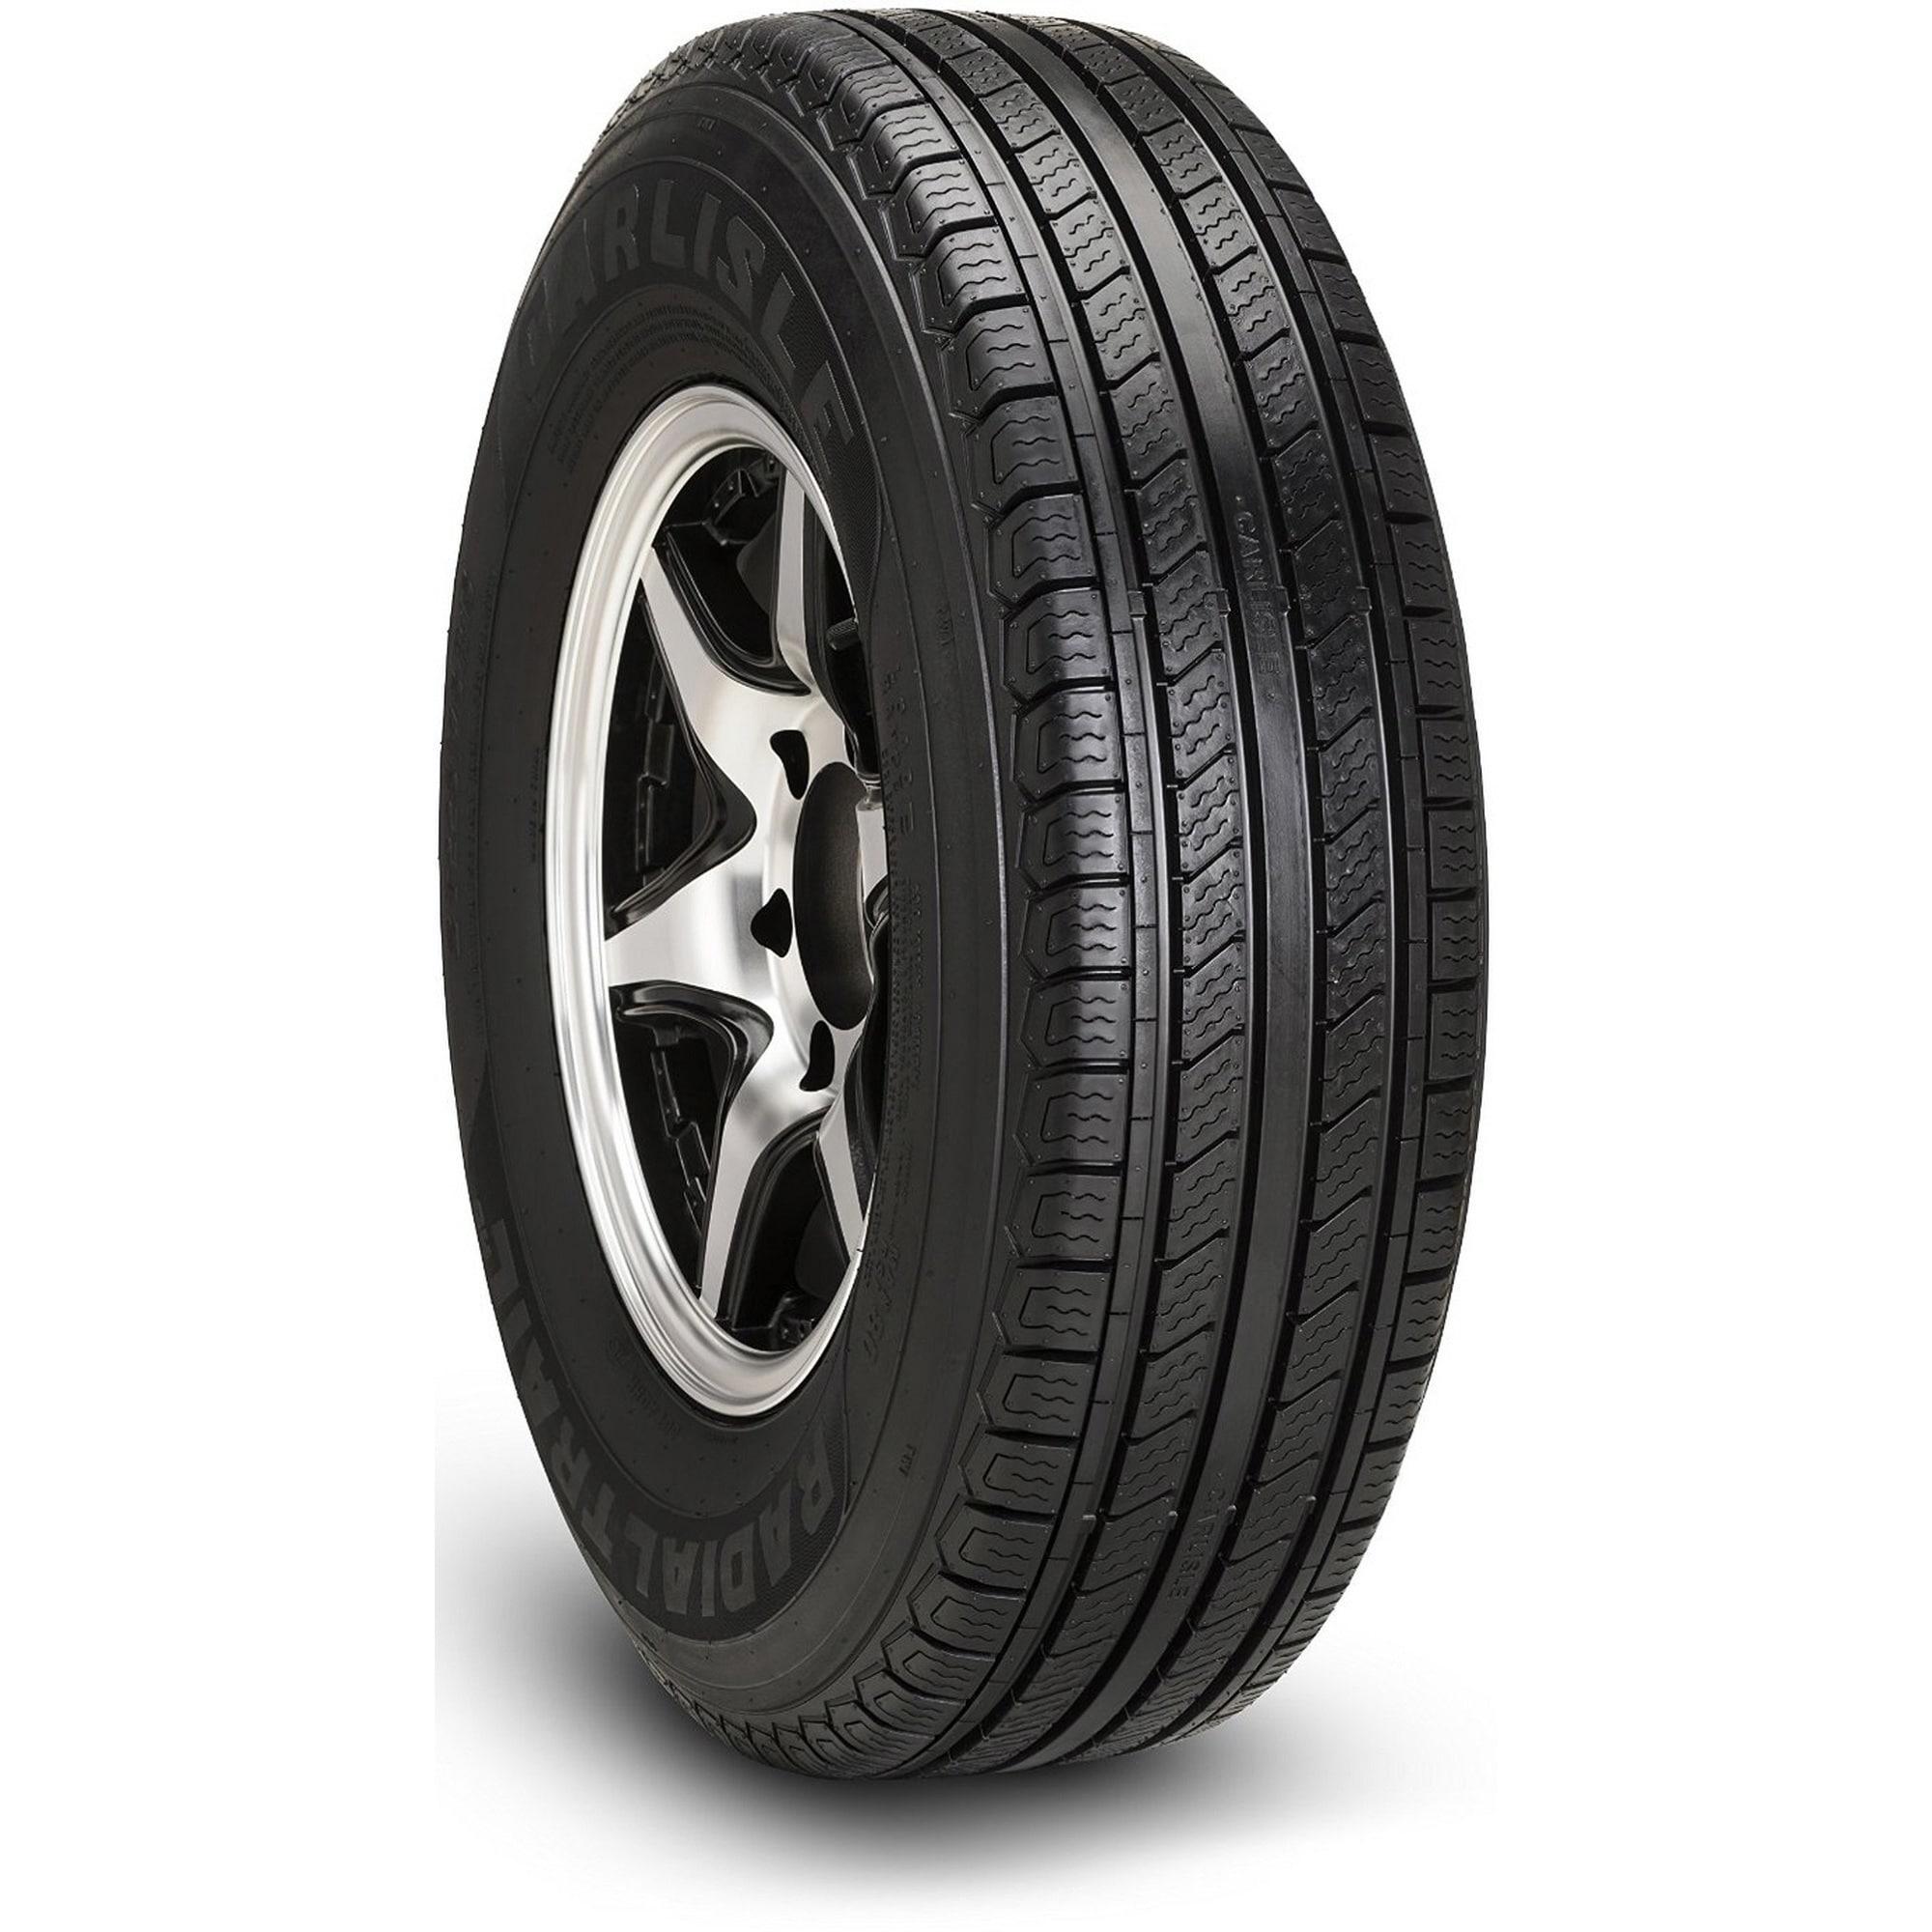 Carlisle Radial Trail HD Trailer Tire - ST235/80R16 LRE/1...